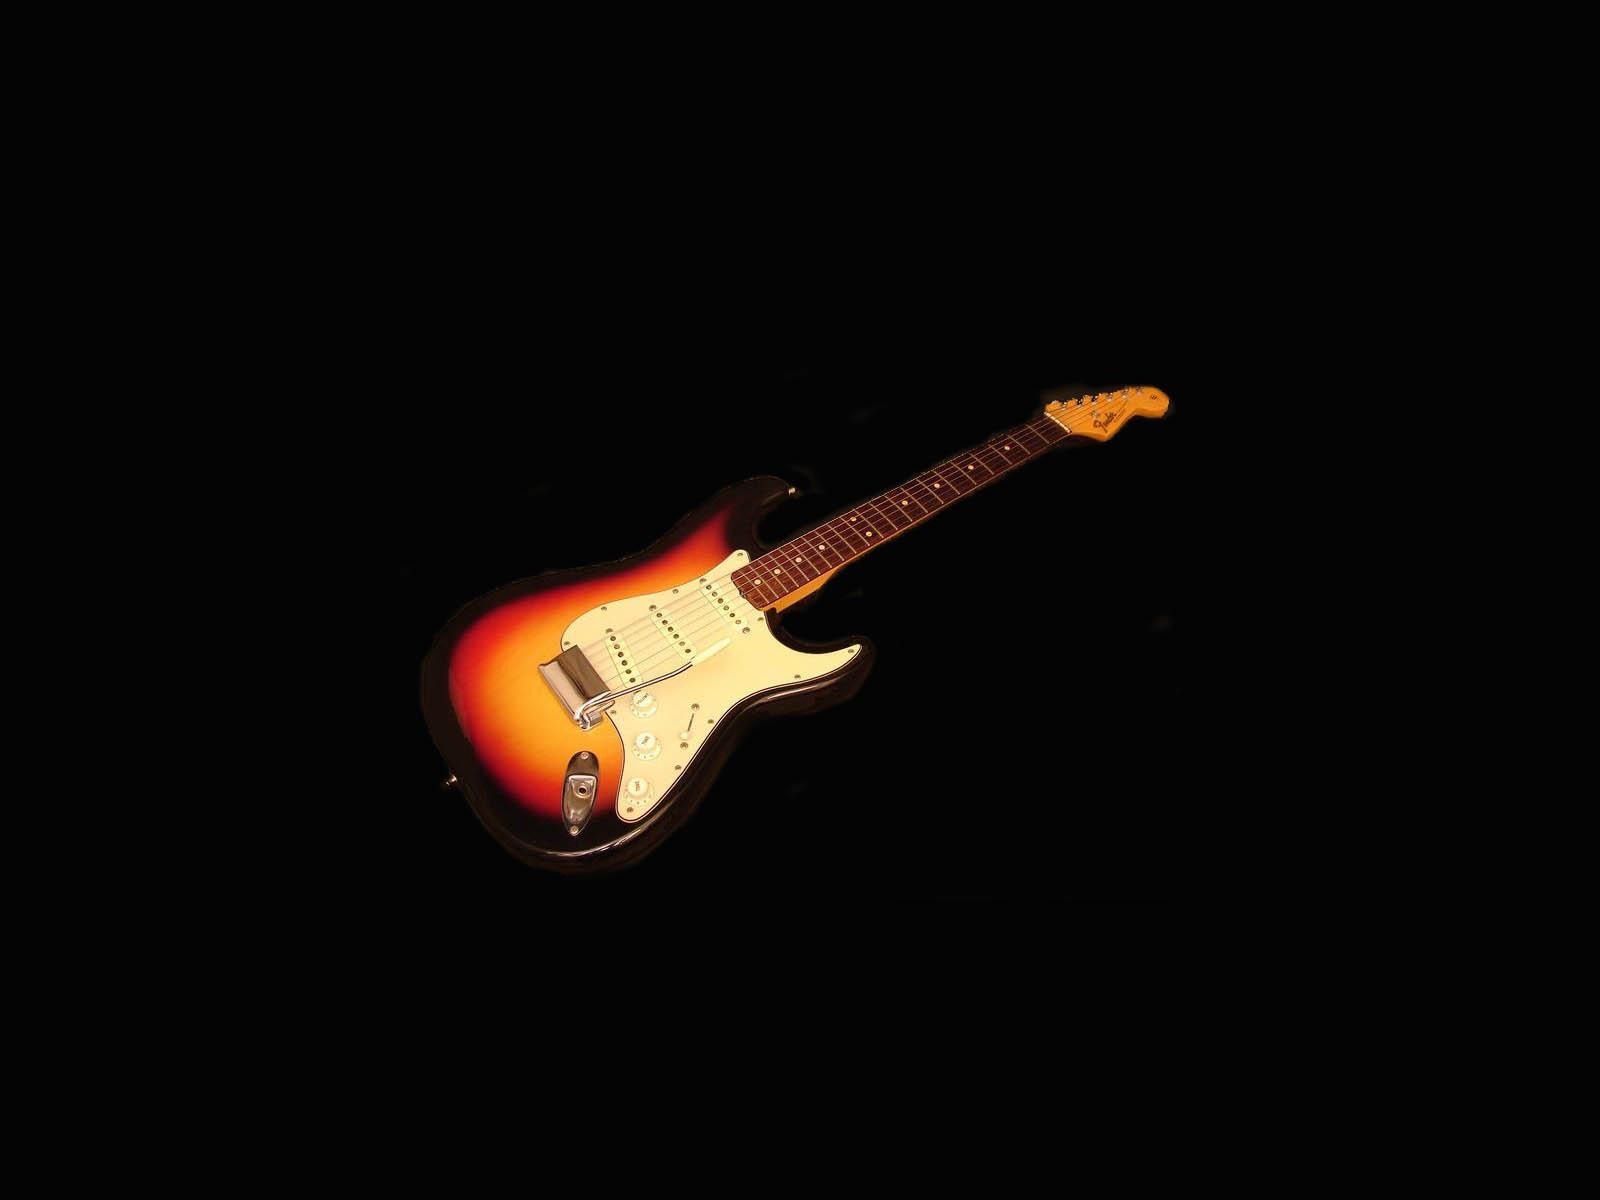 Guitar Fender Wallpaper 17375 Hd Wallpapers in Music   Imagescicom 1600x1200